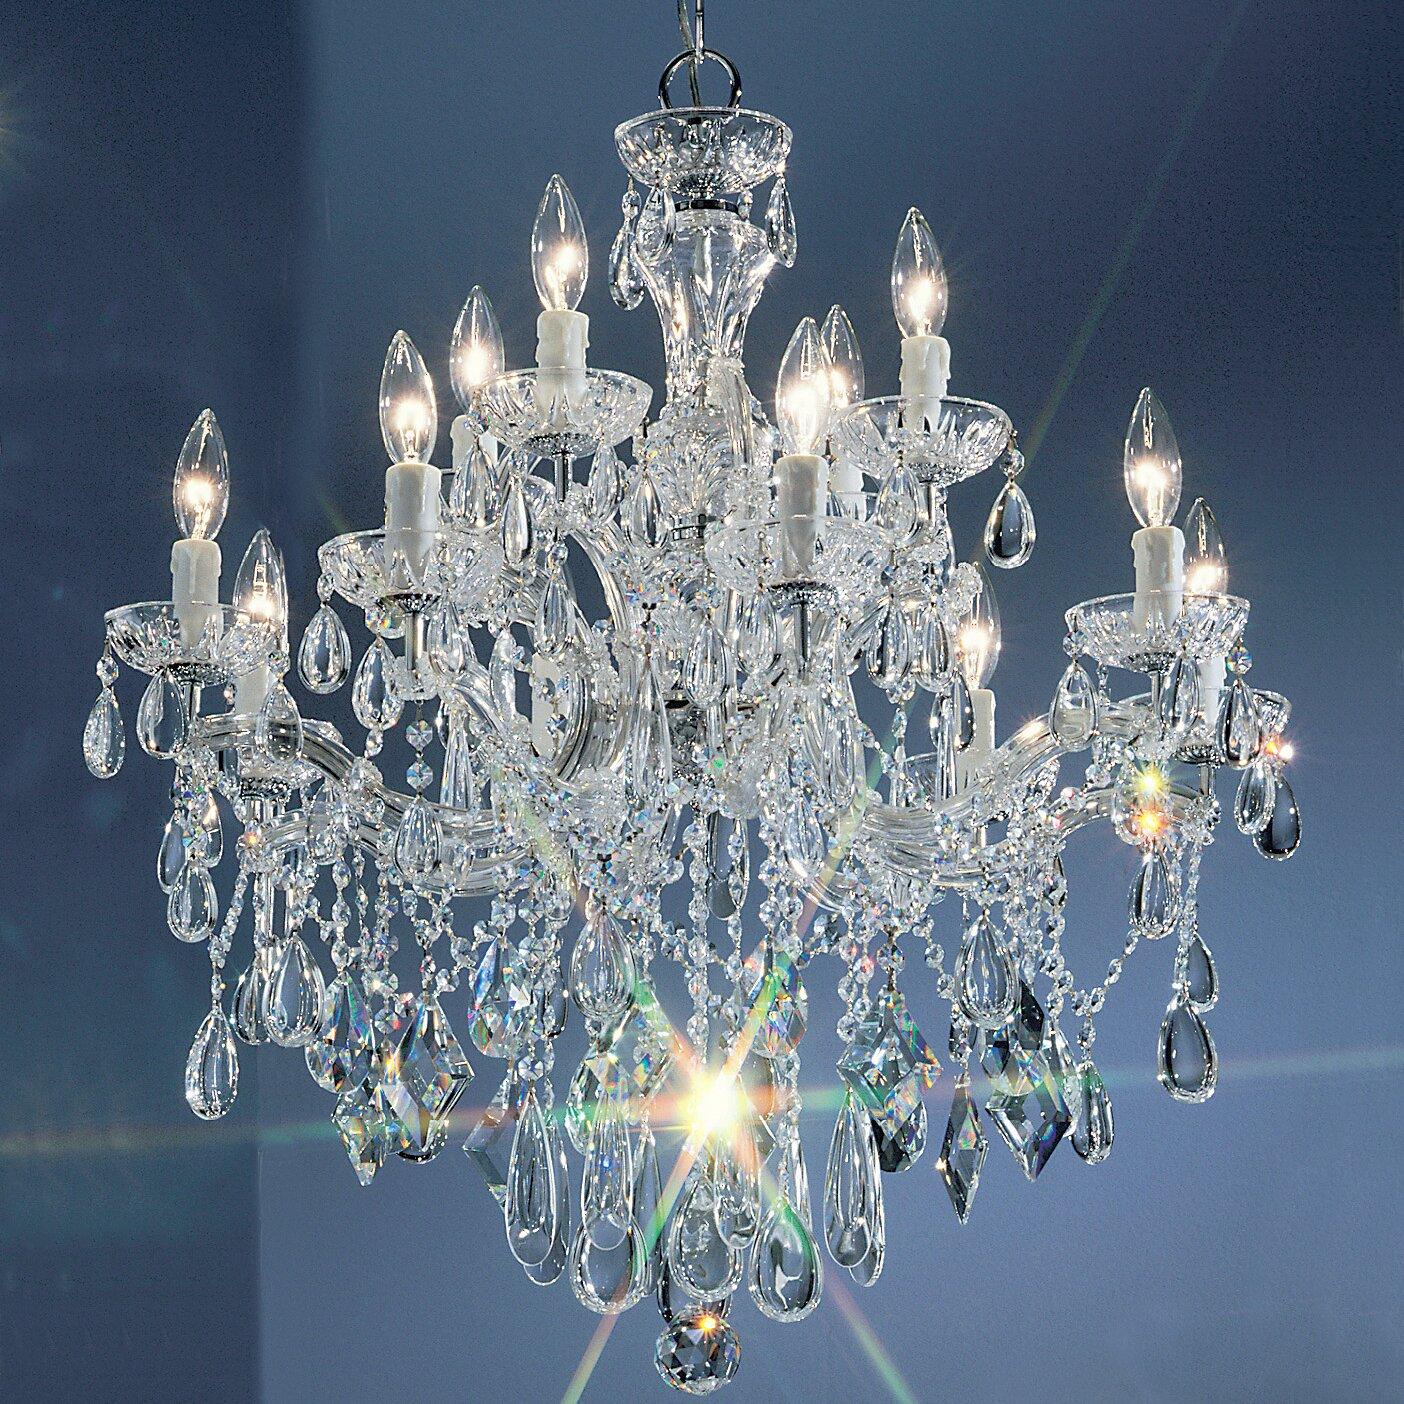 Classic Lighting Rialto 12 Light Crystal Chandelier